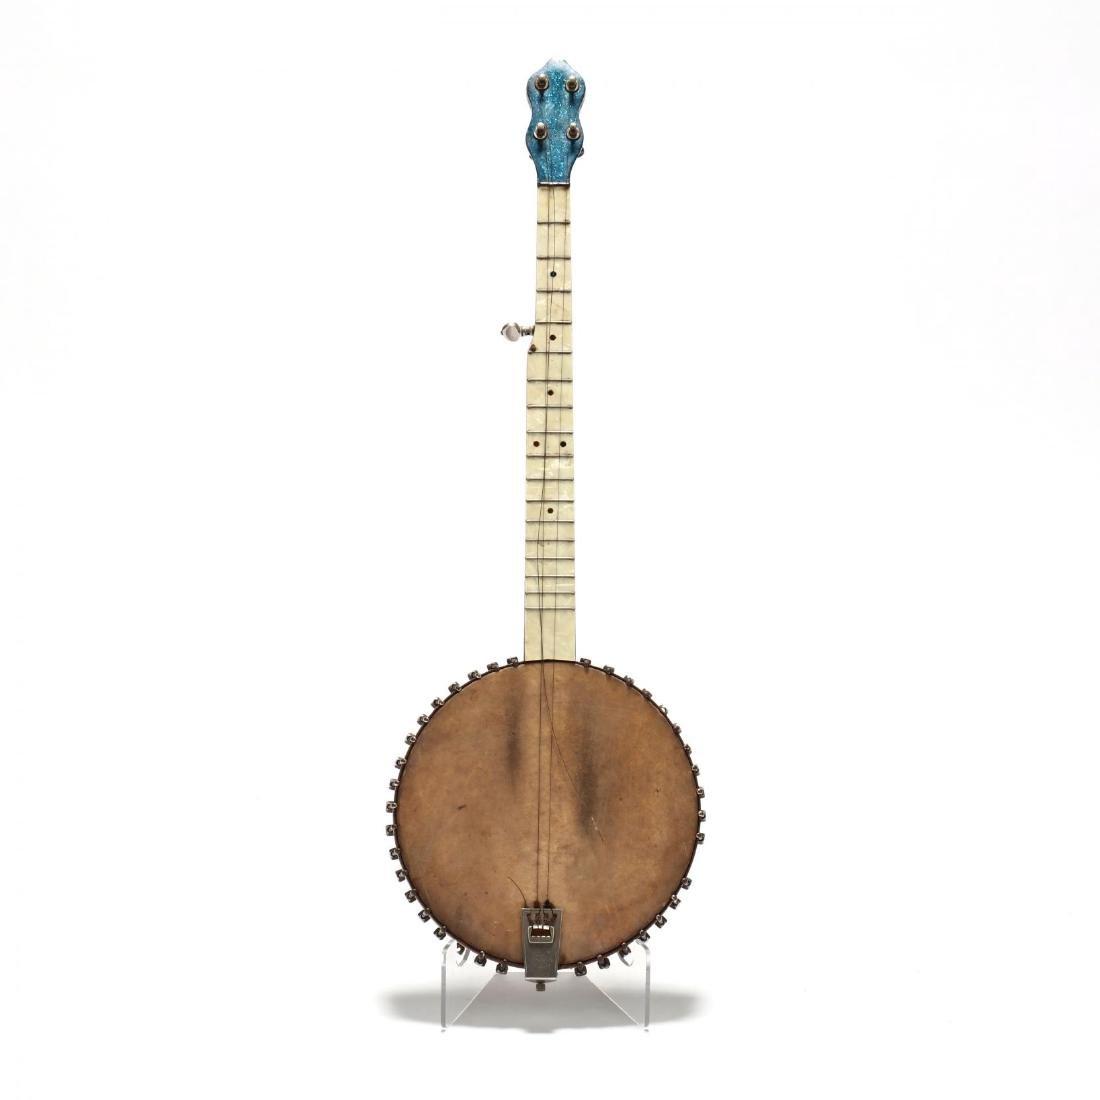 Unmarked Novelty 5-String Open Back Banjo